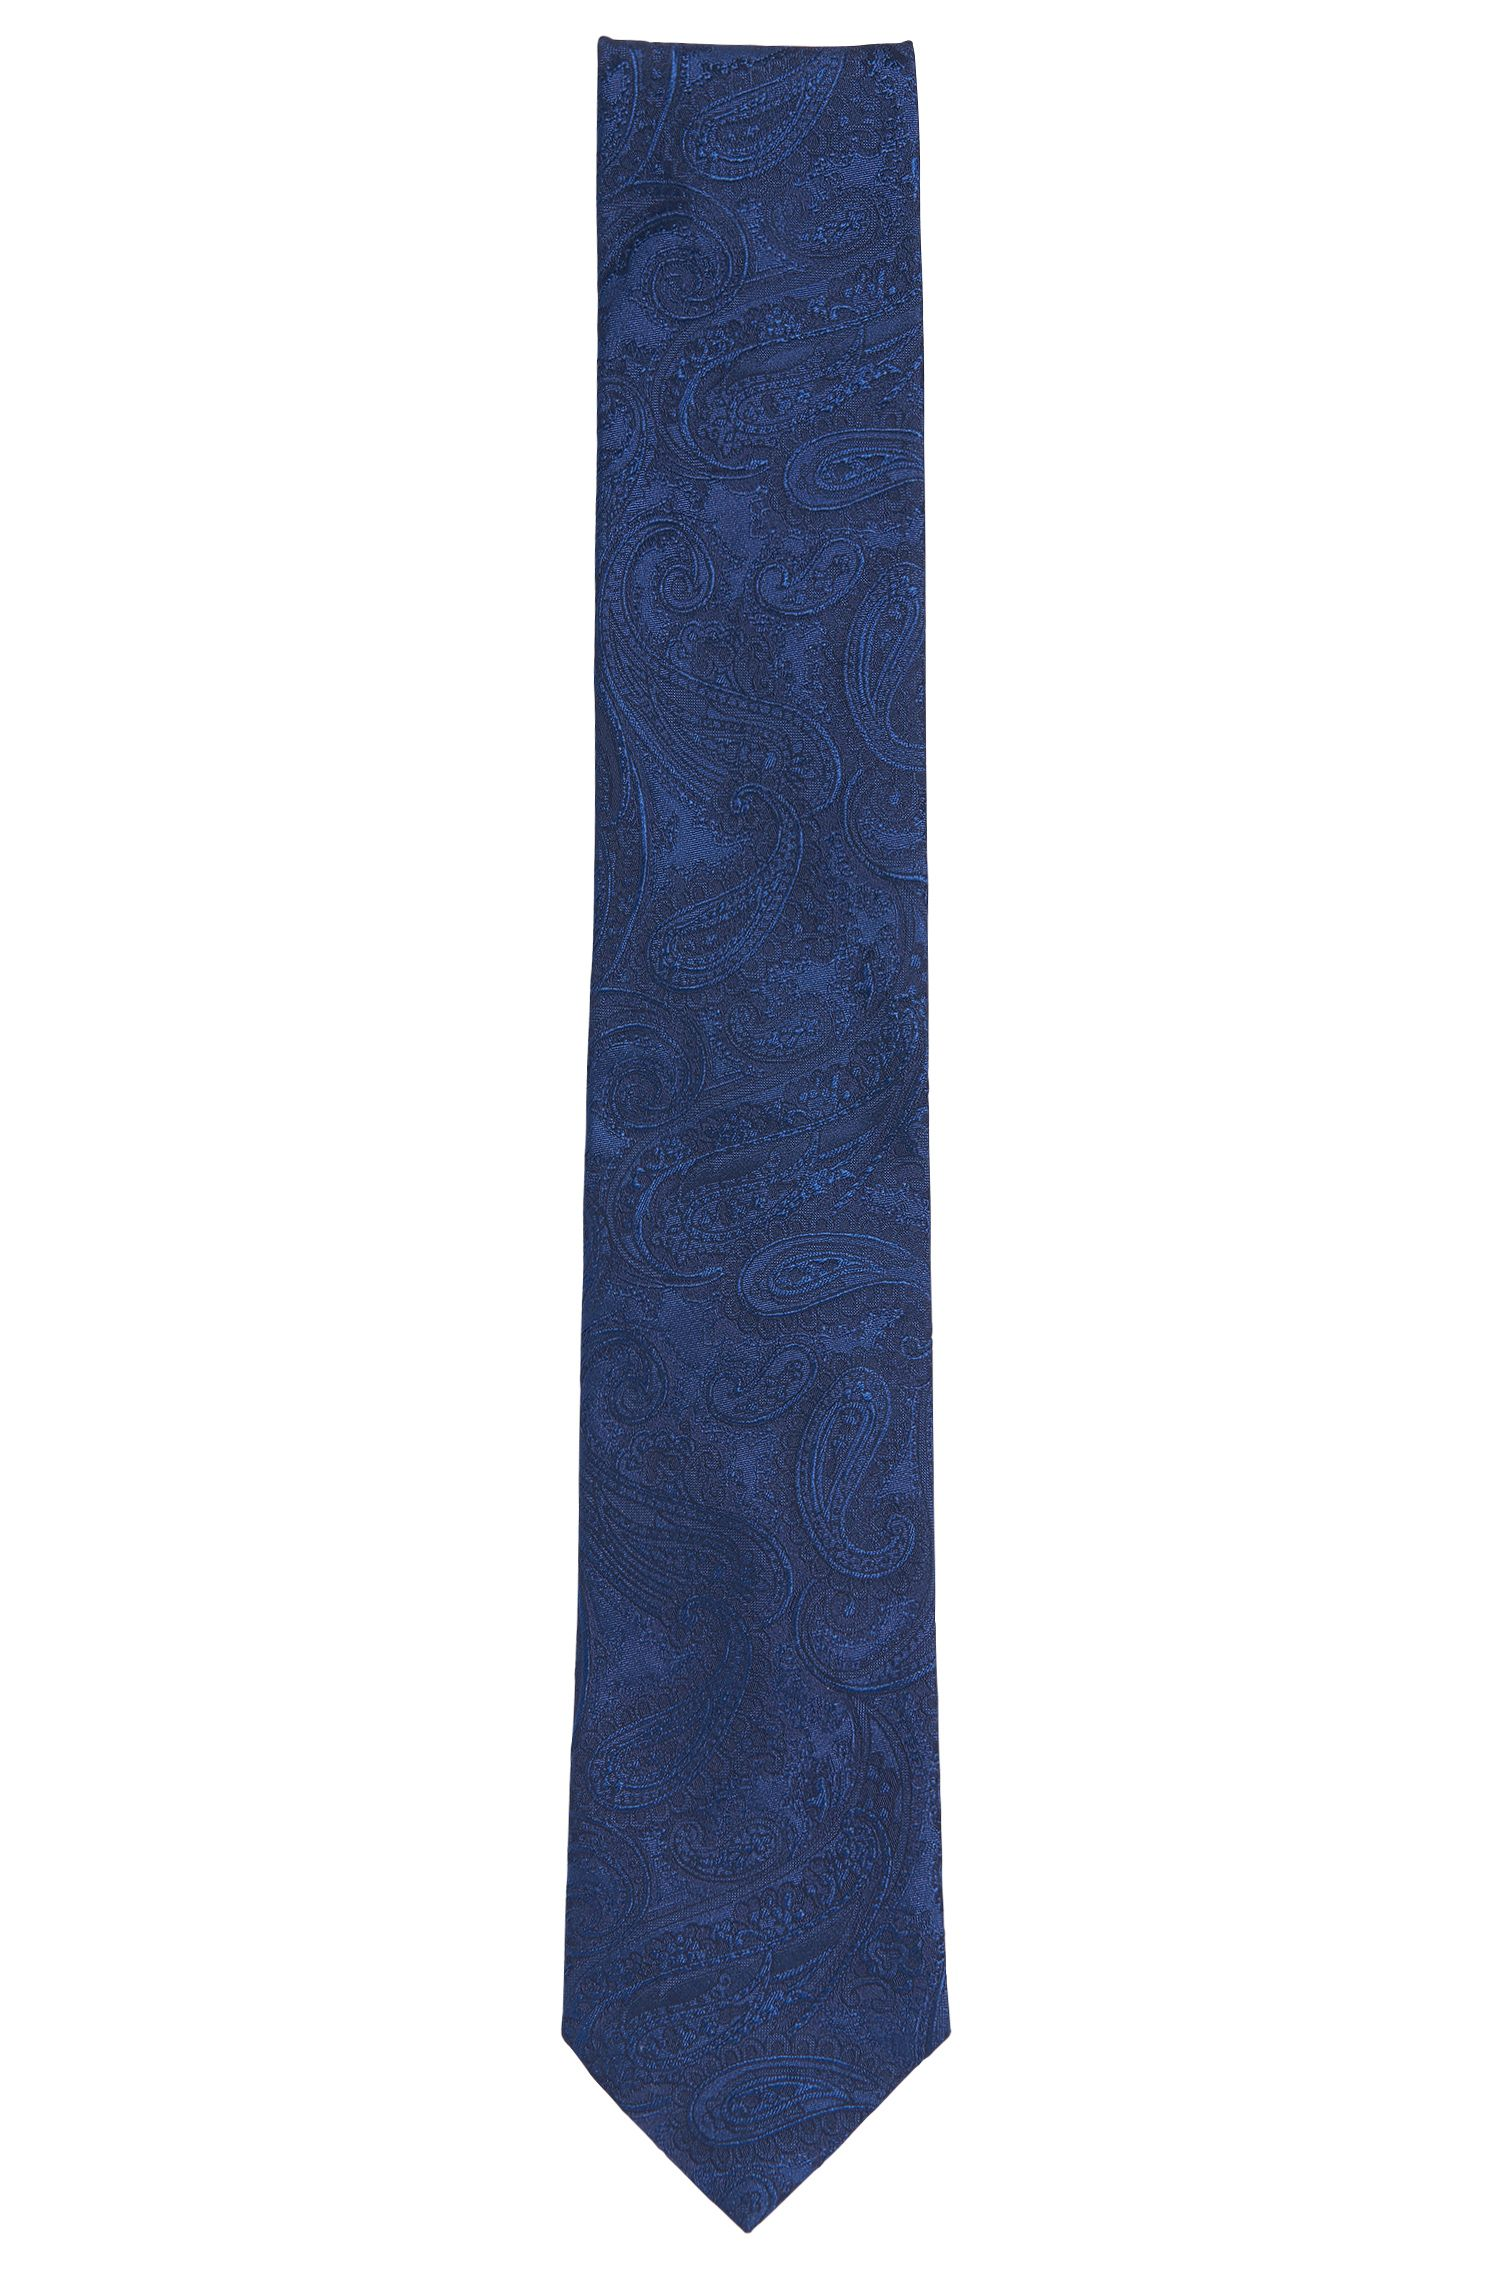 Seidenkrawatte mit Paisely-Muster: 'Tie cm 7'